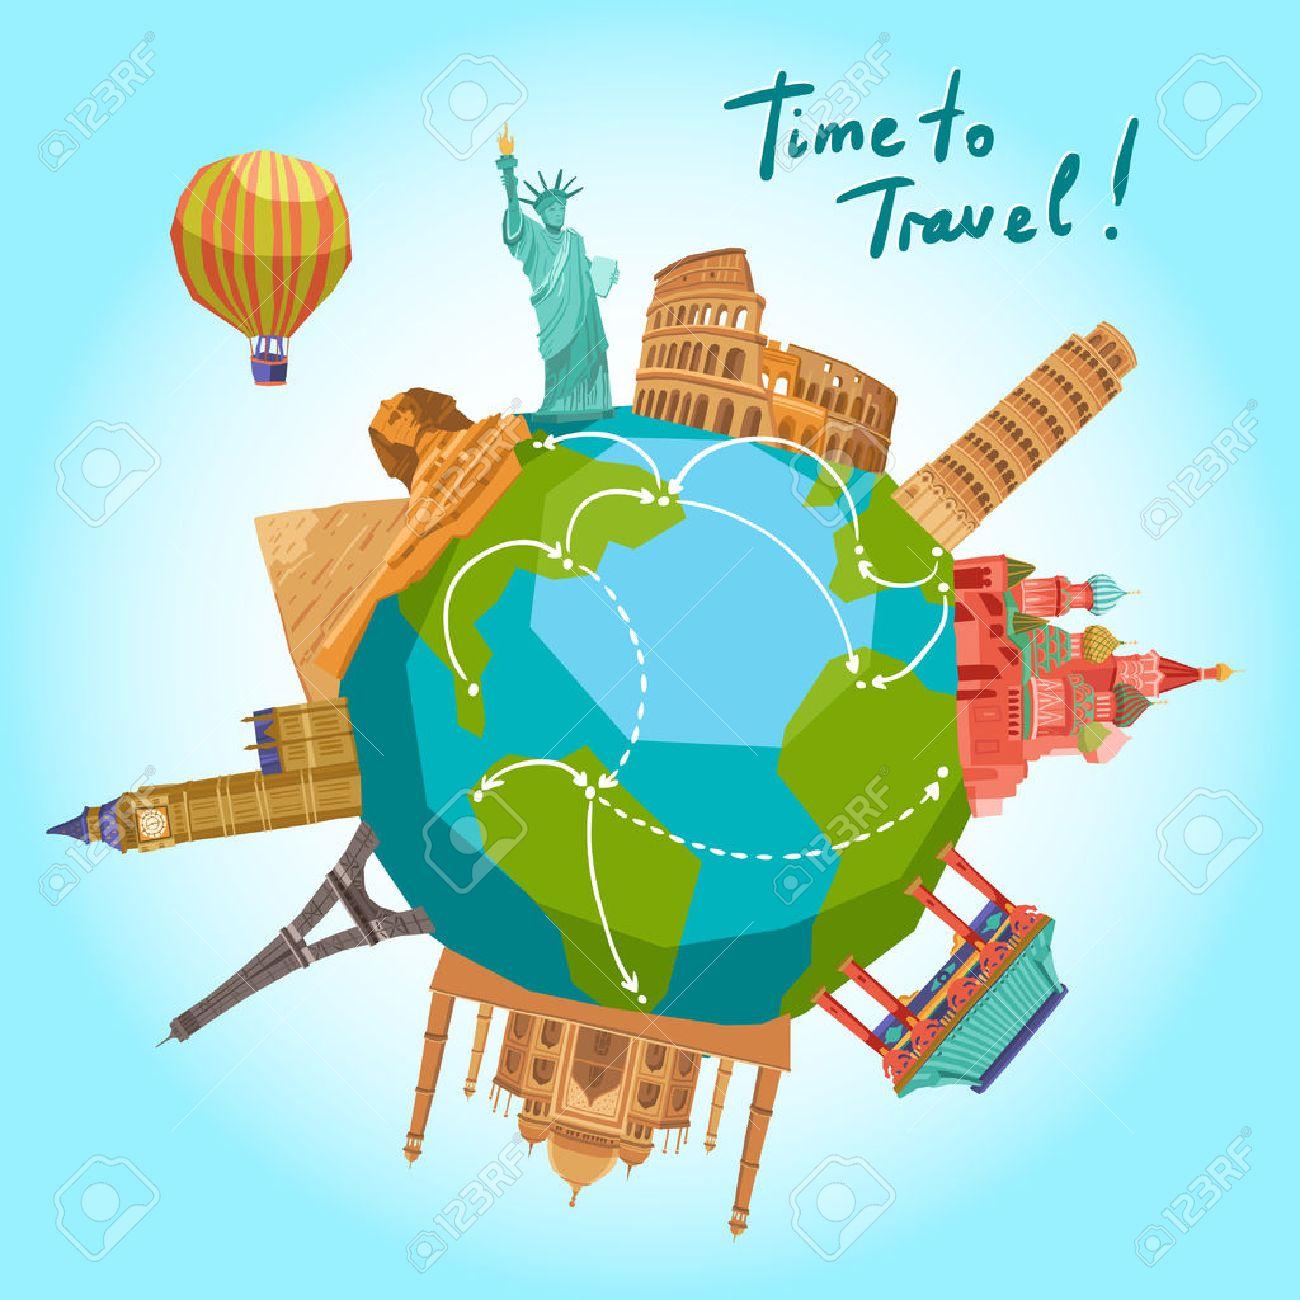 Travel background with world landmarks around the globe vector illustration - 40442750